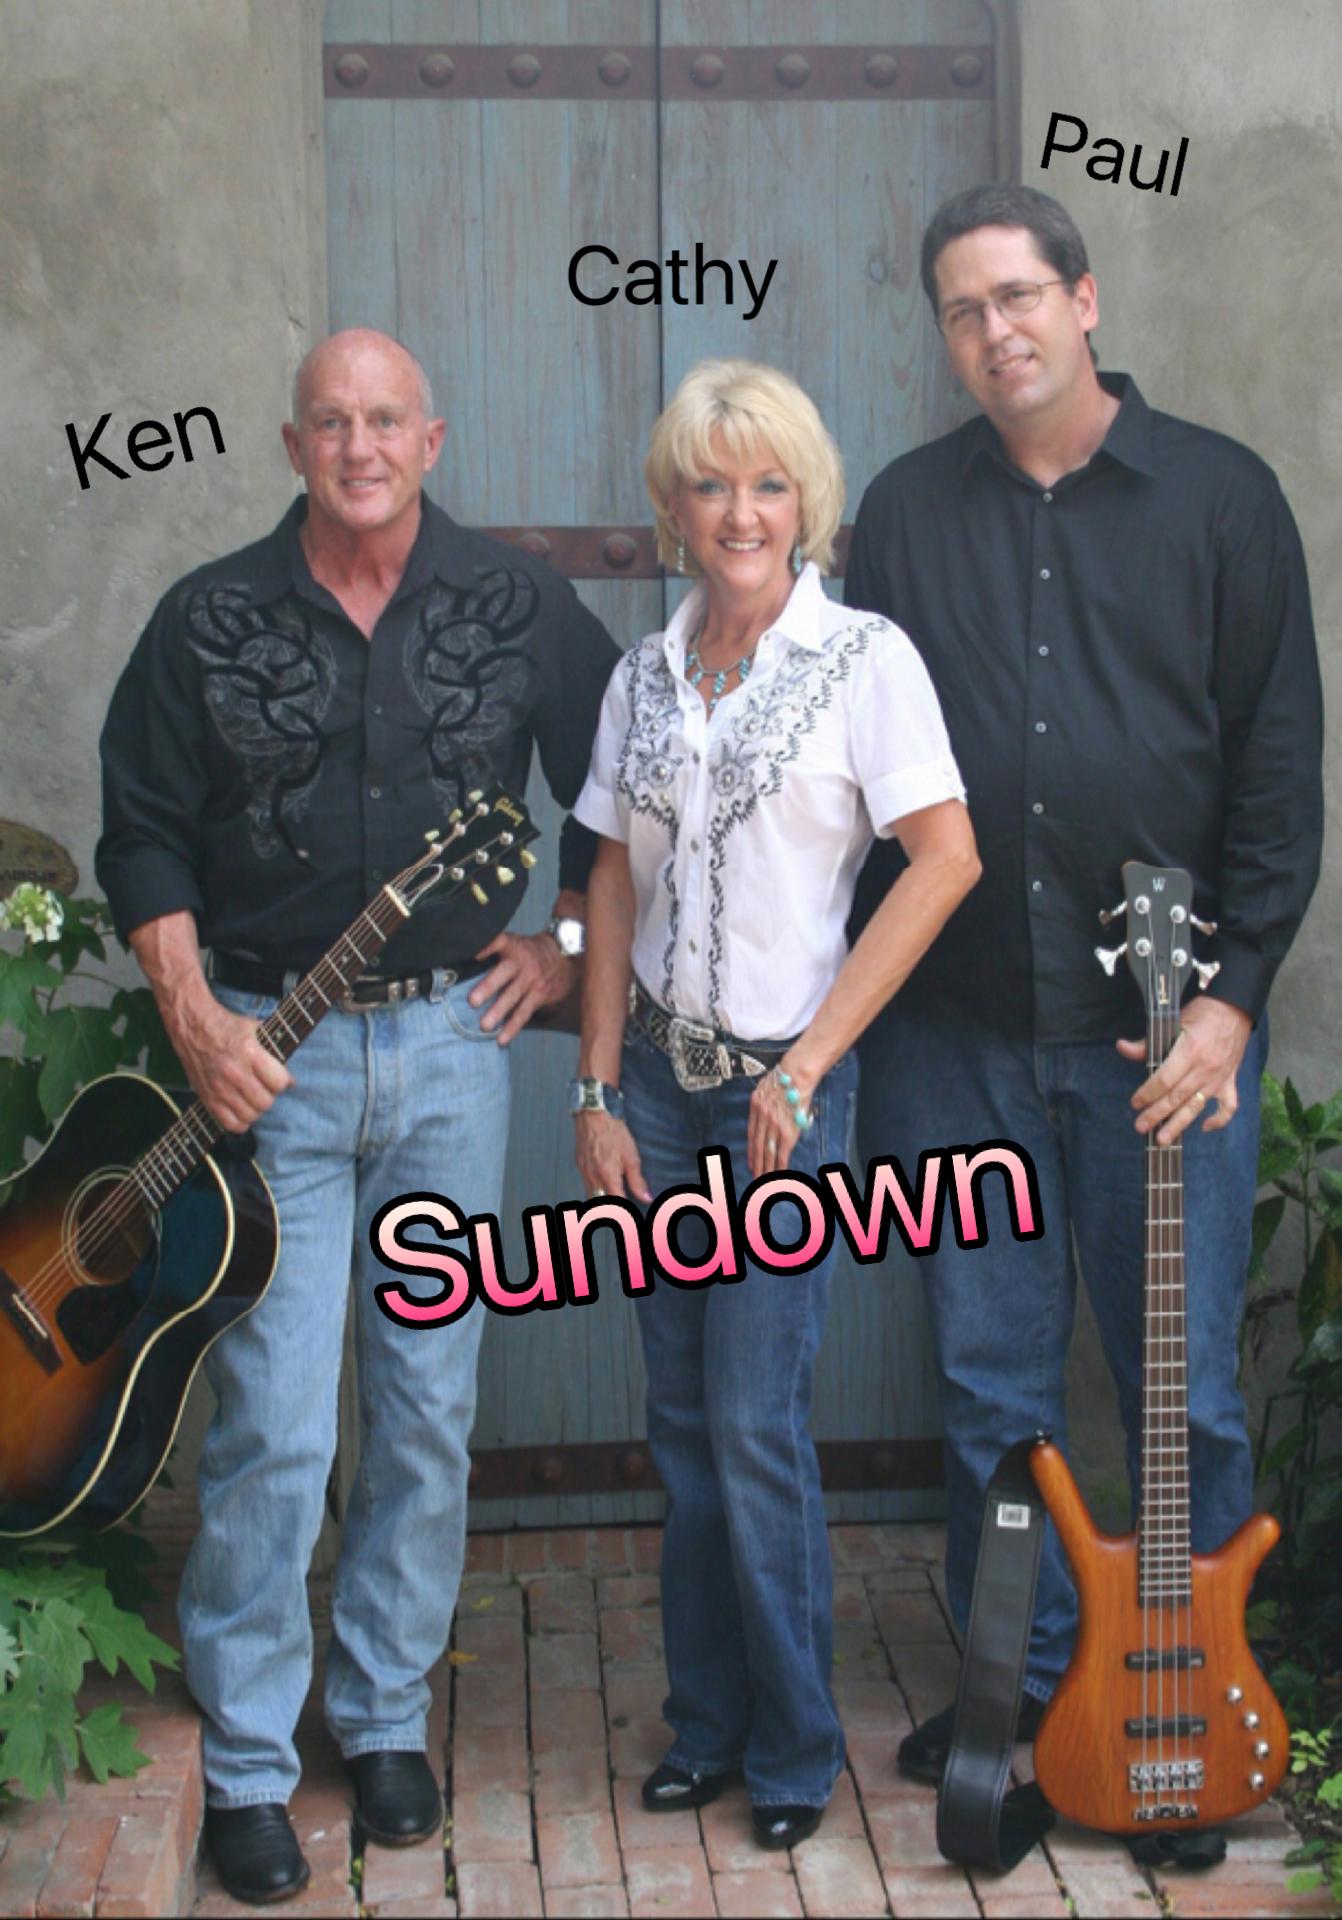 Our Band, Sundown at Louisiana Street Grill Friday January 6th....7:30 till 10:30